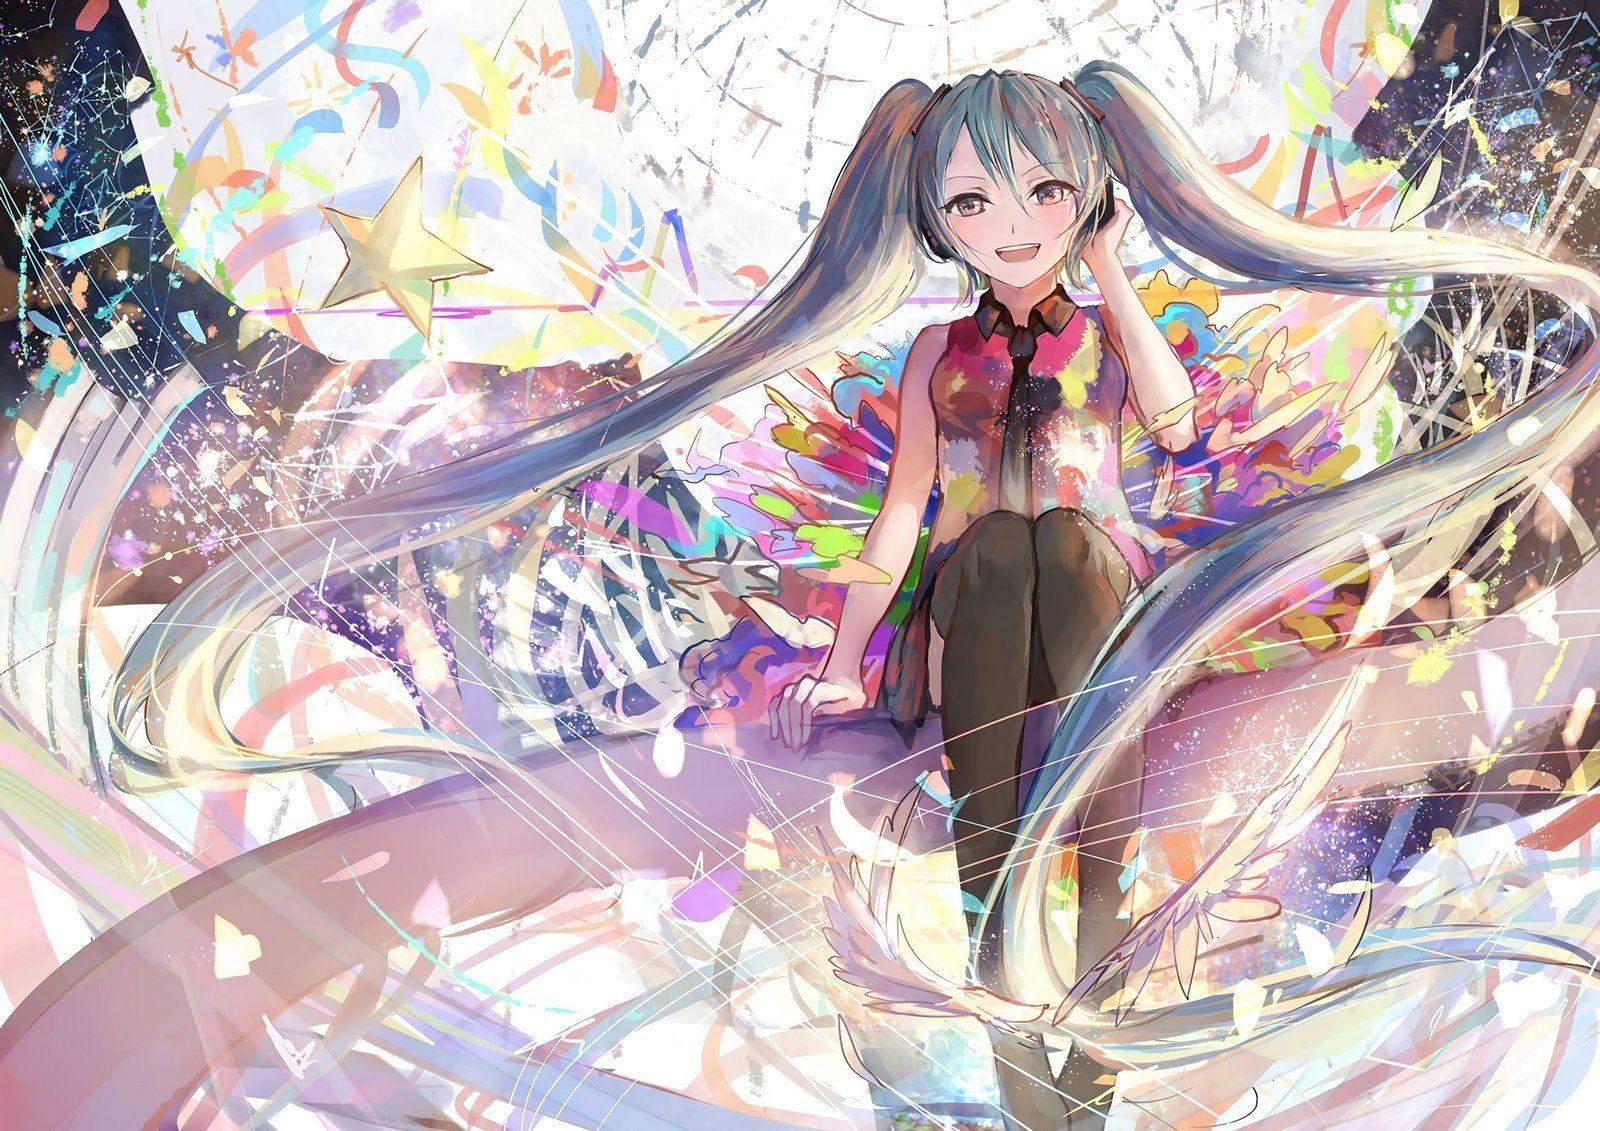 Anime Vocaloid Hatsune Miku Girl Long Hair Twintails Aqua